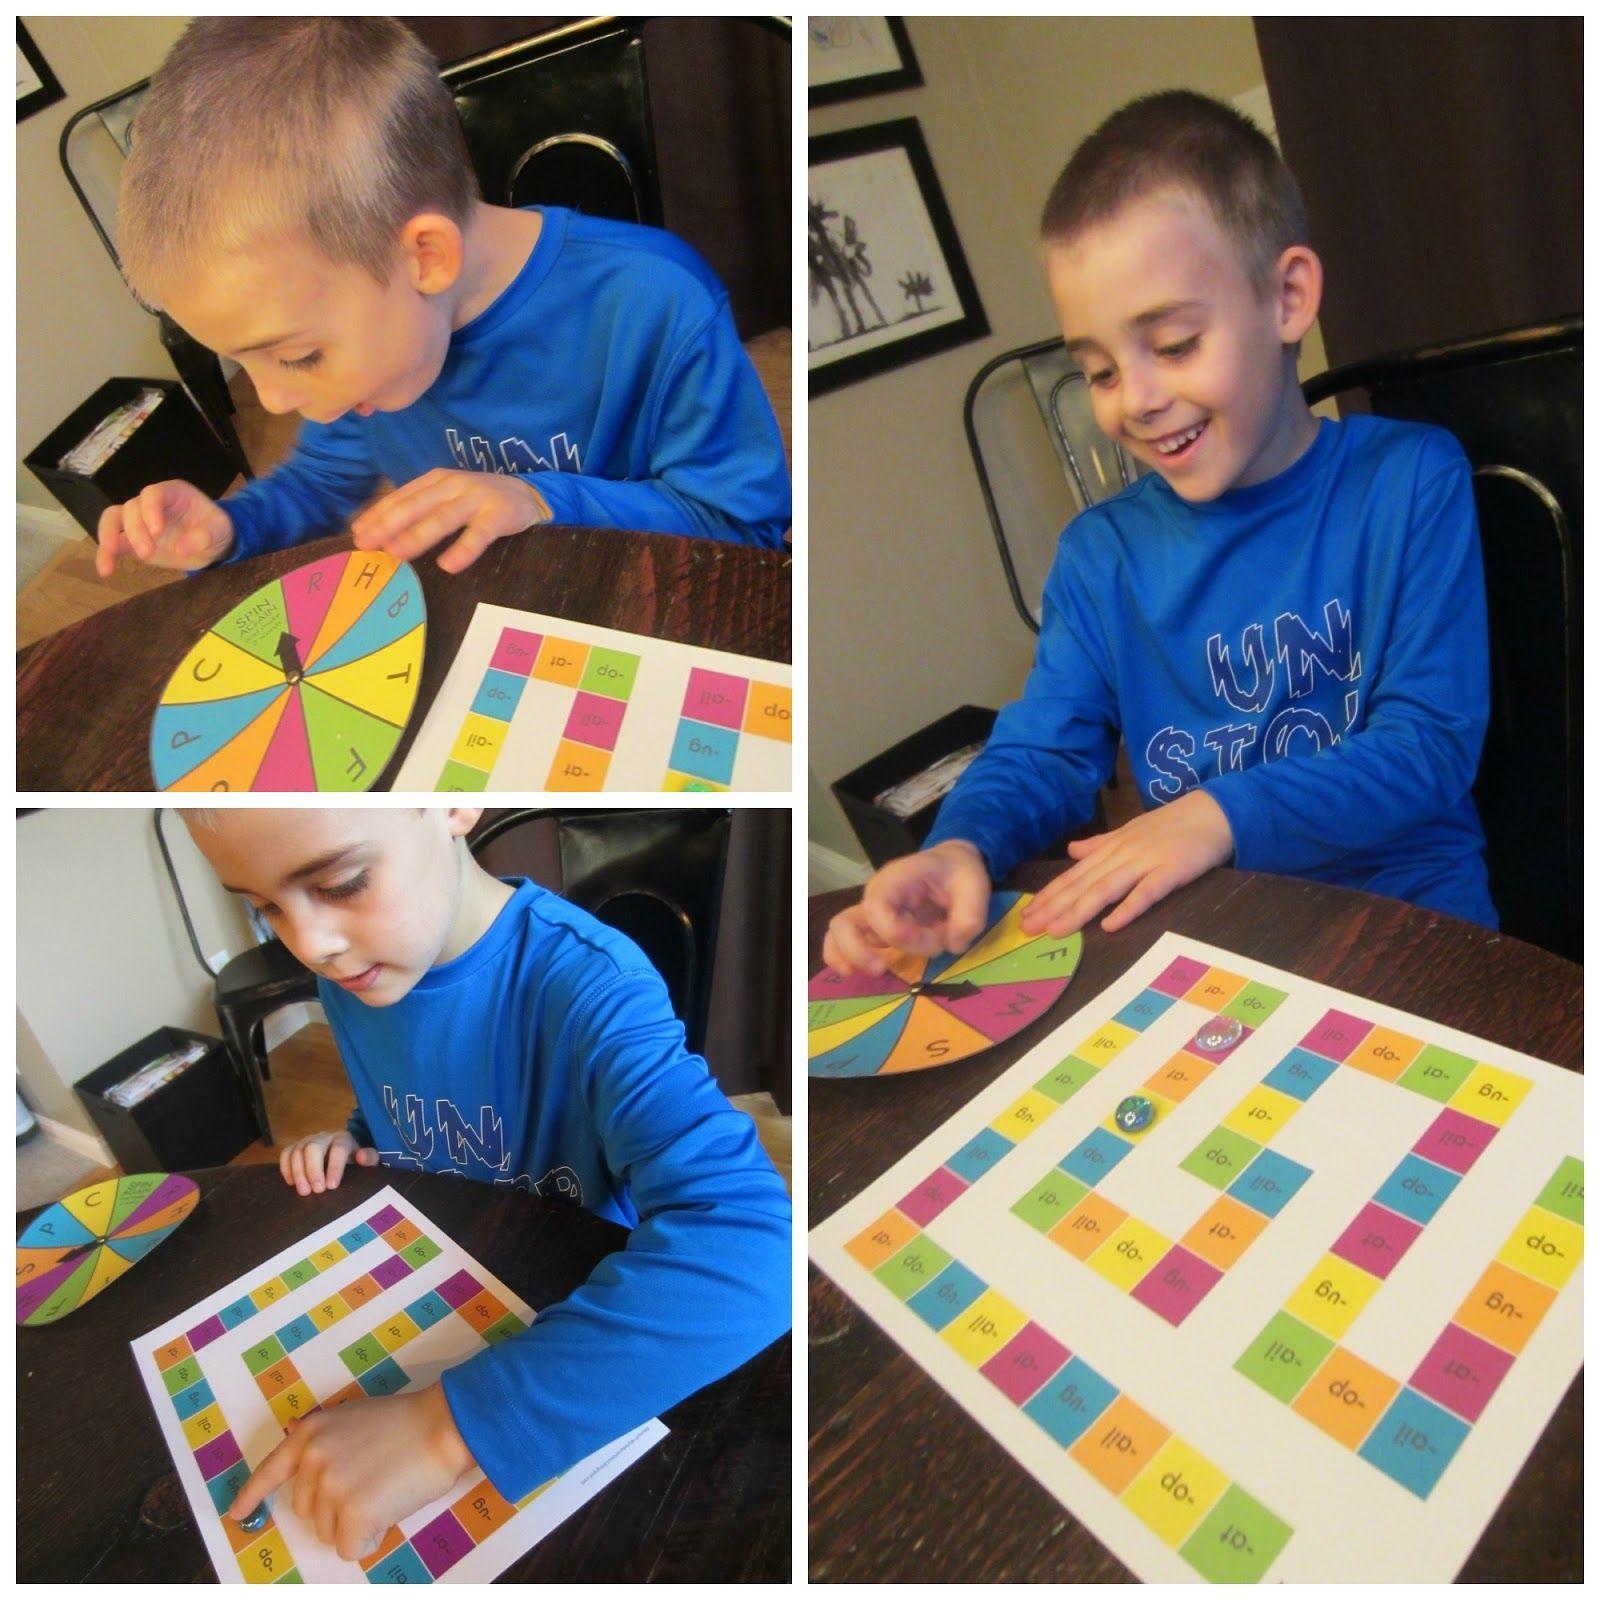 Word Family Board Game Free Printable At Ug Op